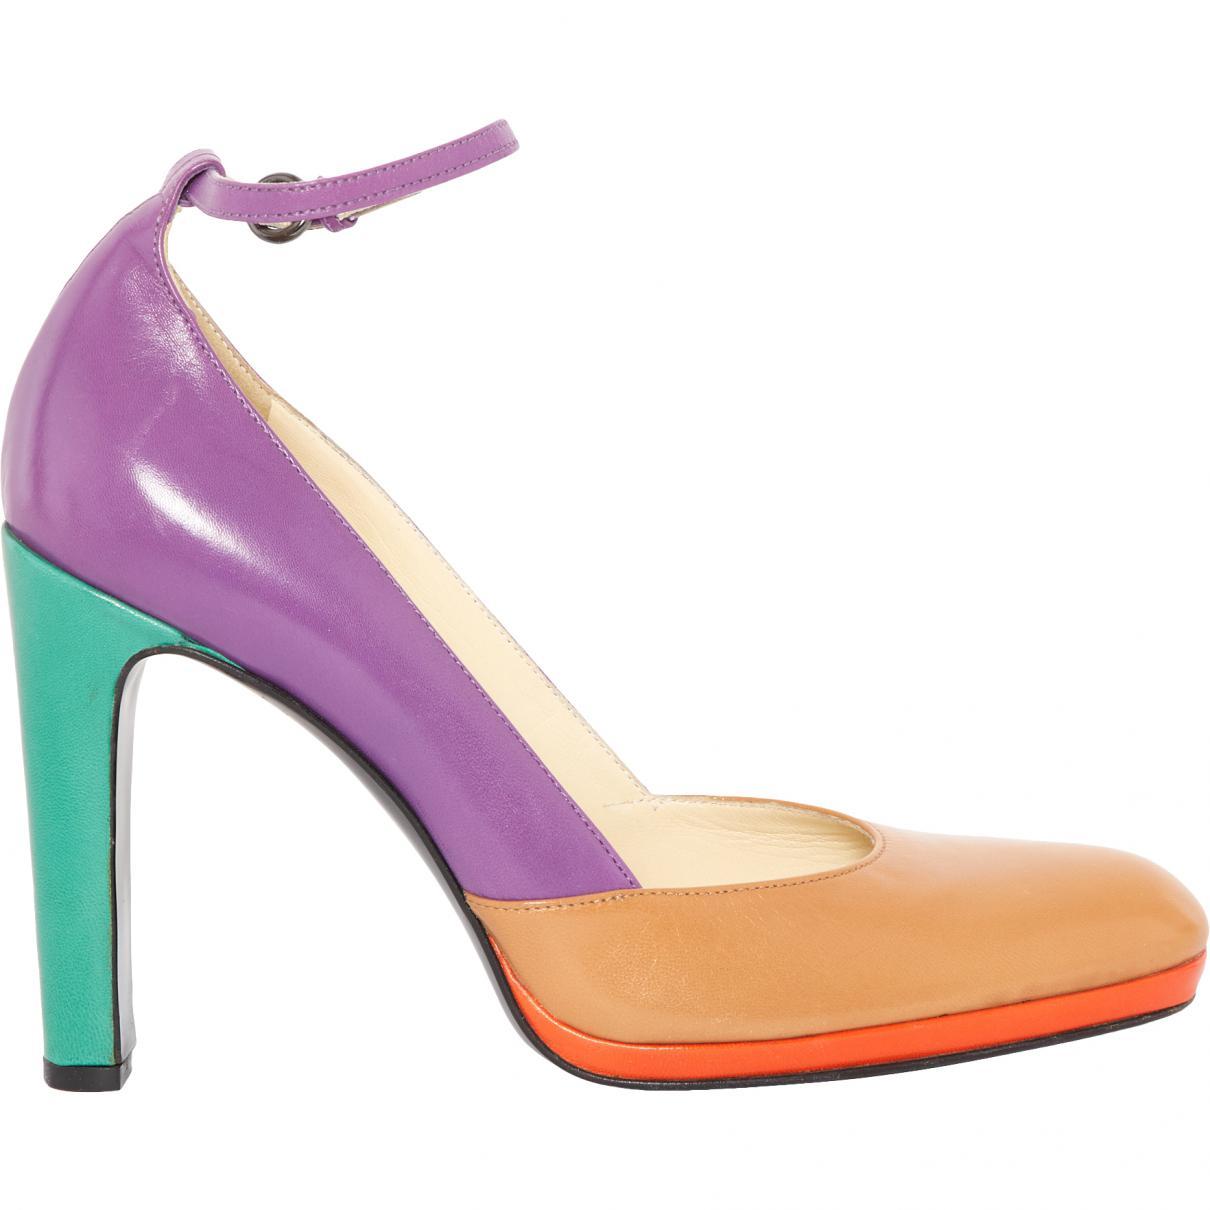 72192b46e495 Lyst - Miu Miu Leather Heels in Pink